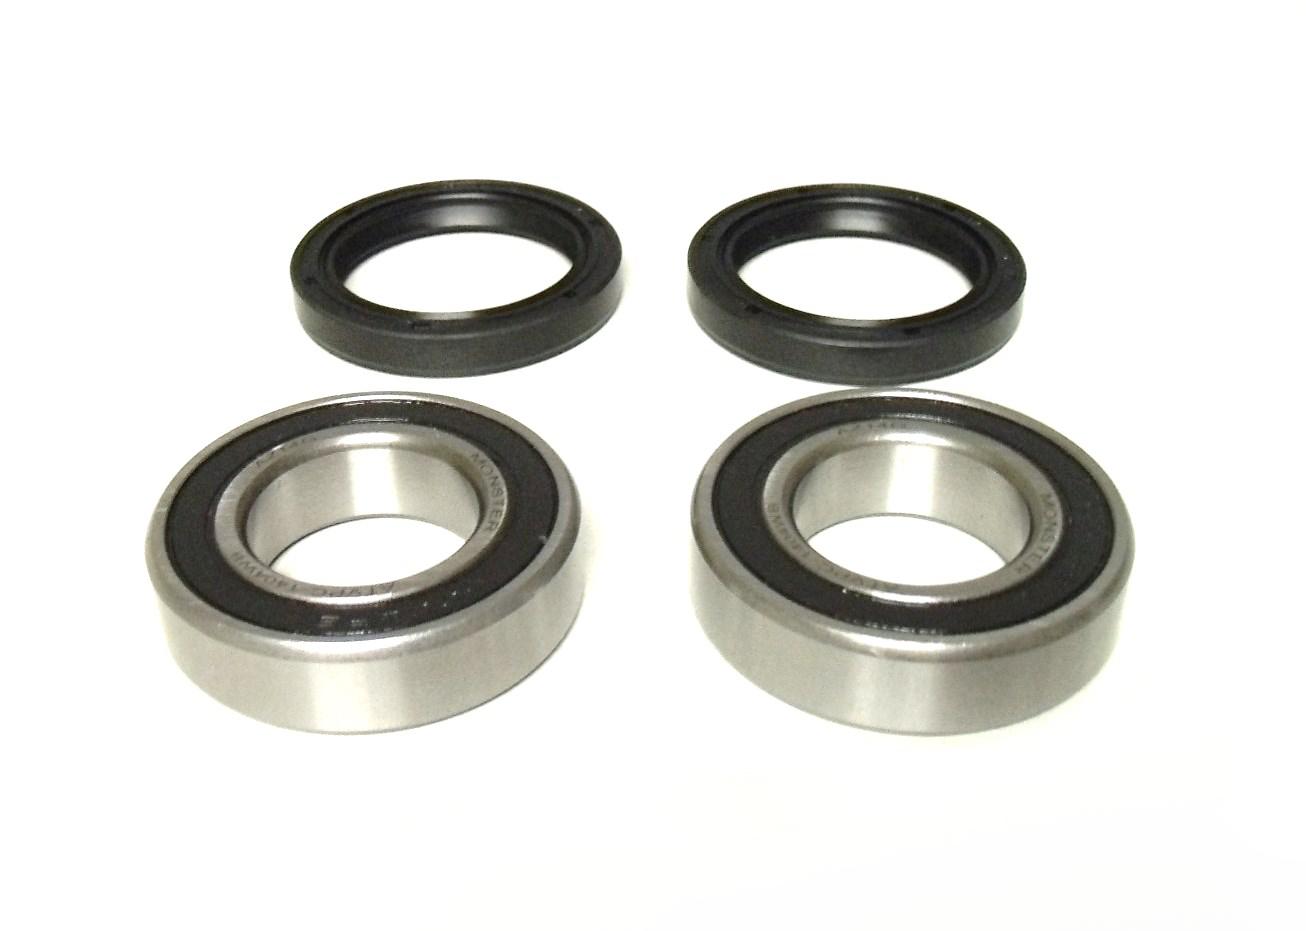 Front Wheel Bearing /& Seal Kit for Kawasaki Mule 2010 2020 2030 3010 2510 2500 2520 3000 4000 4010 UTV Replaces OE 92045-3707 92049-1025